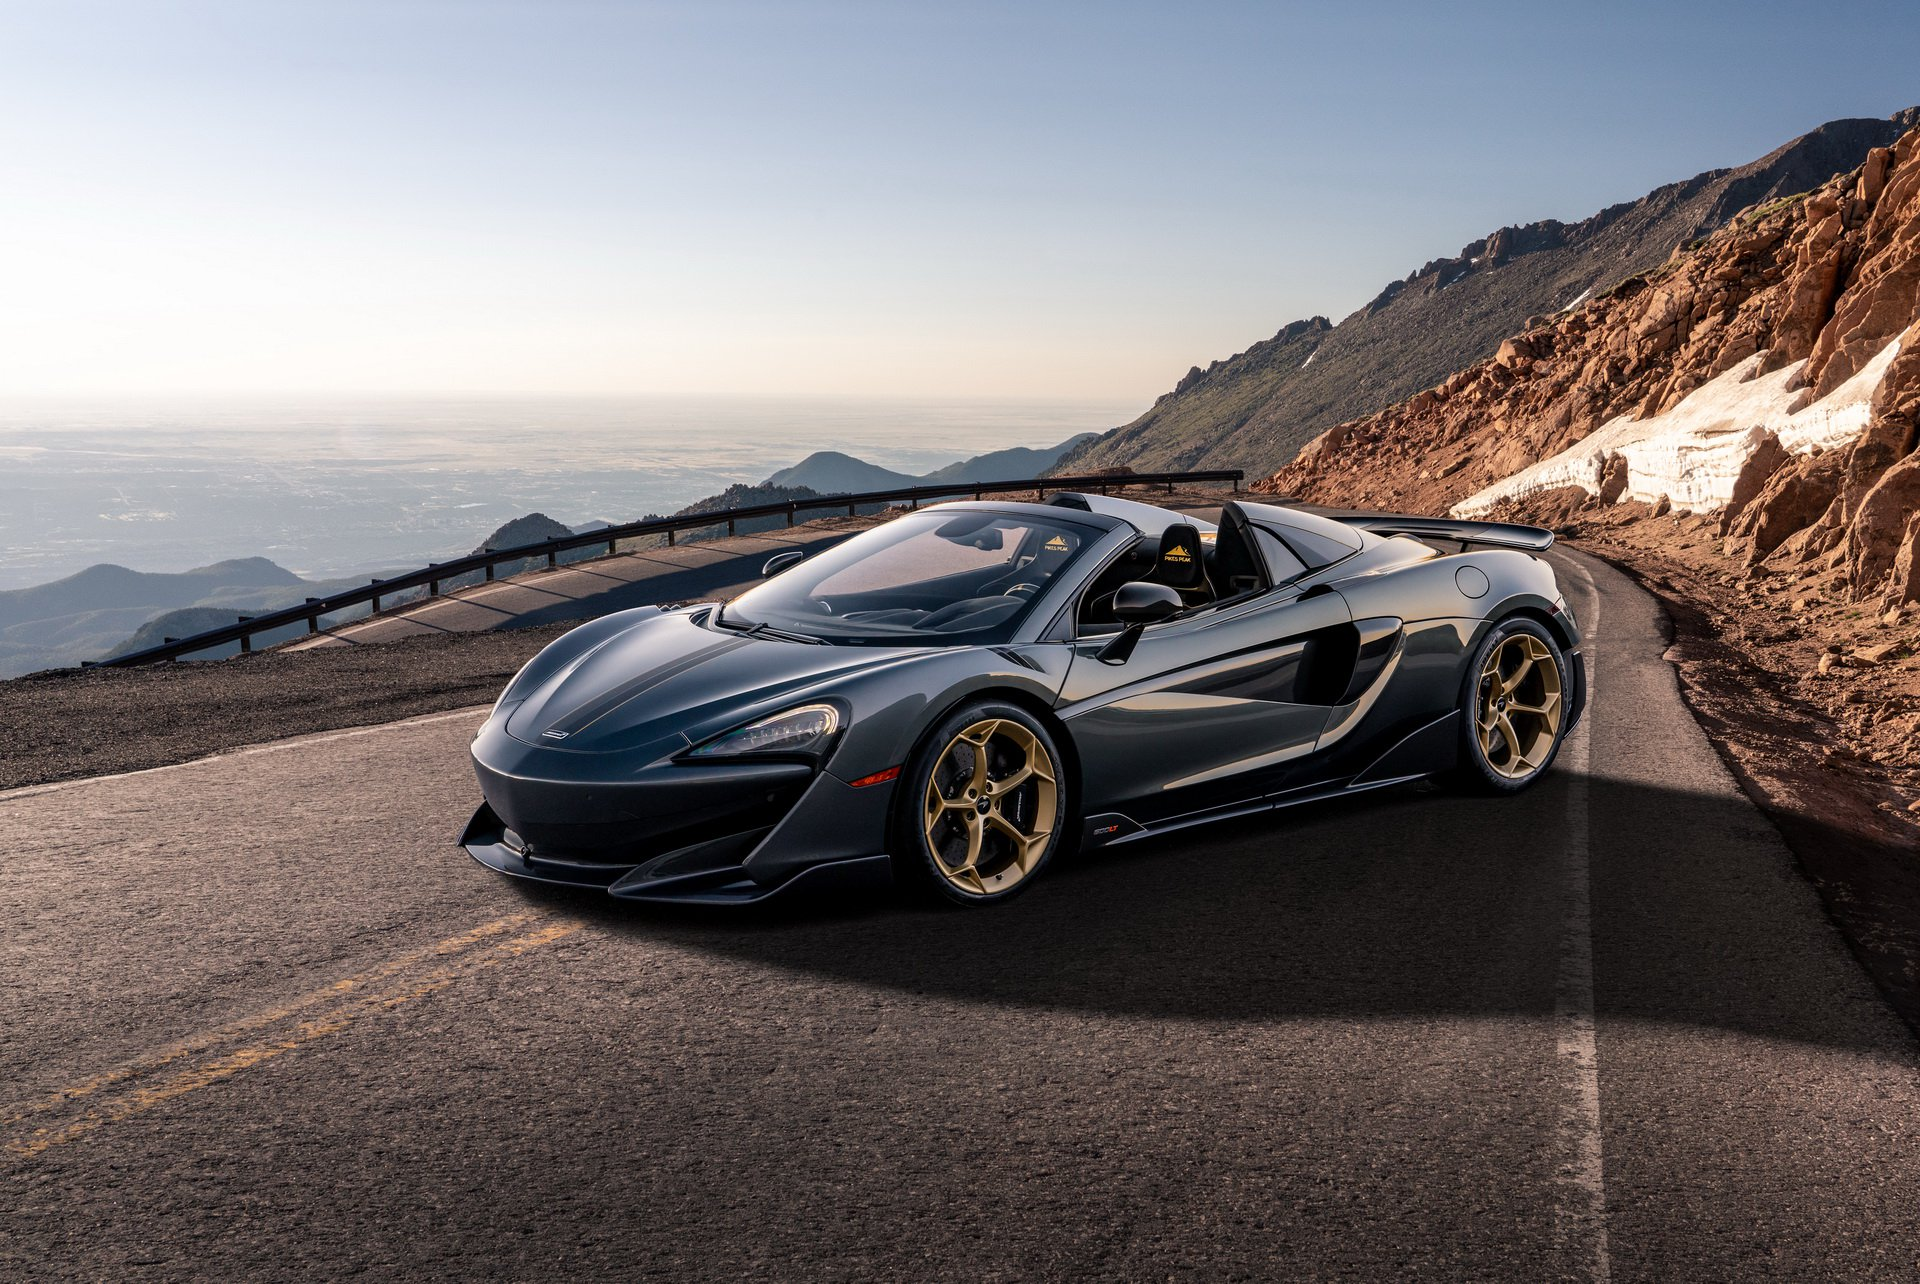 McLaren-600LT-Spider-Pikes-Peak-Collection-by-MSO-7